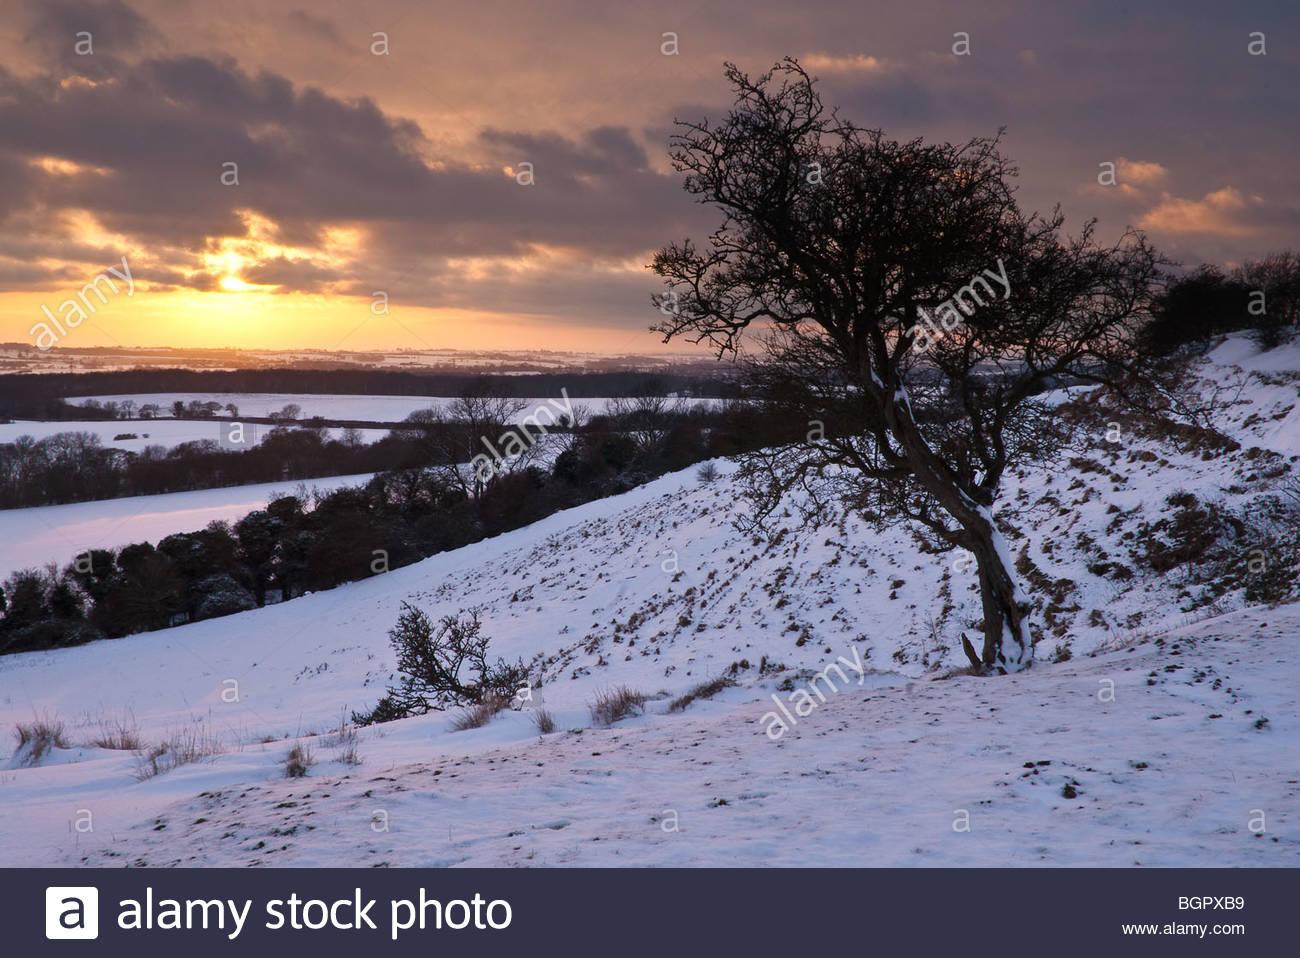 Sunset and snow, Postling Down, Kent, UK. - Stock Image